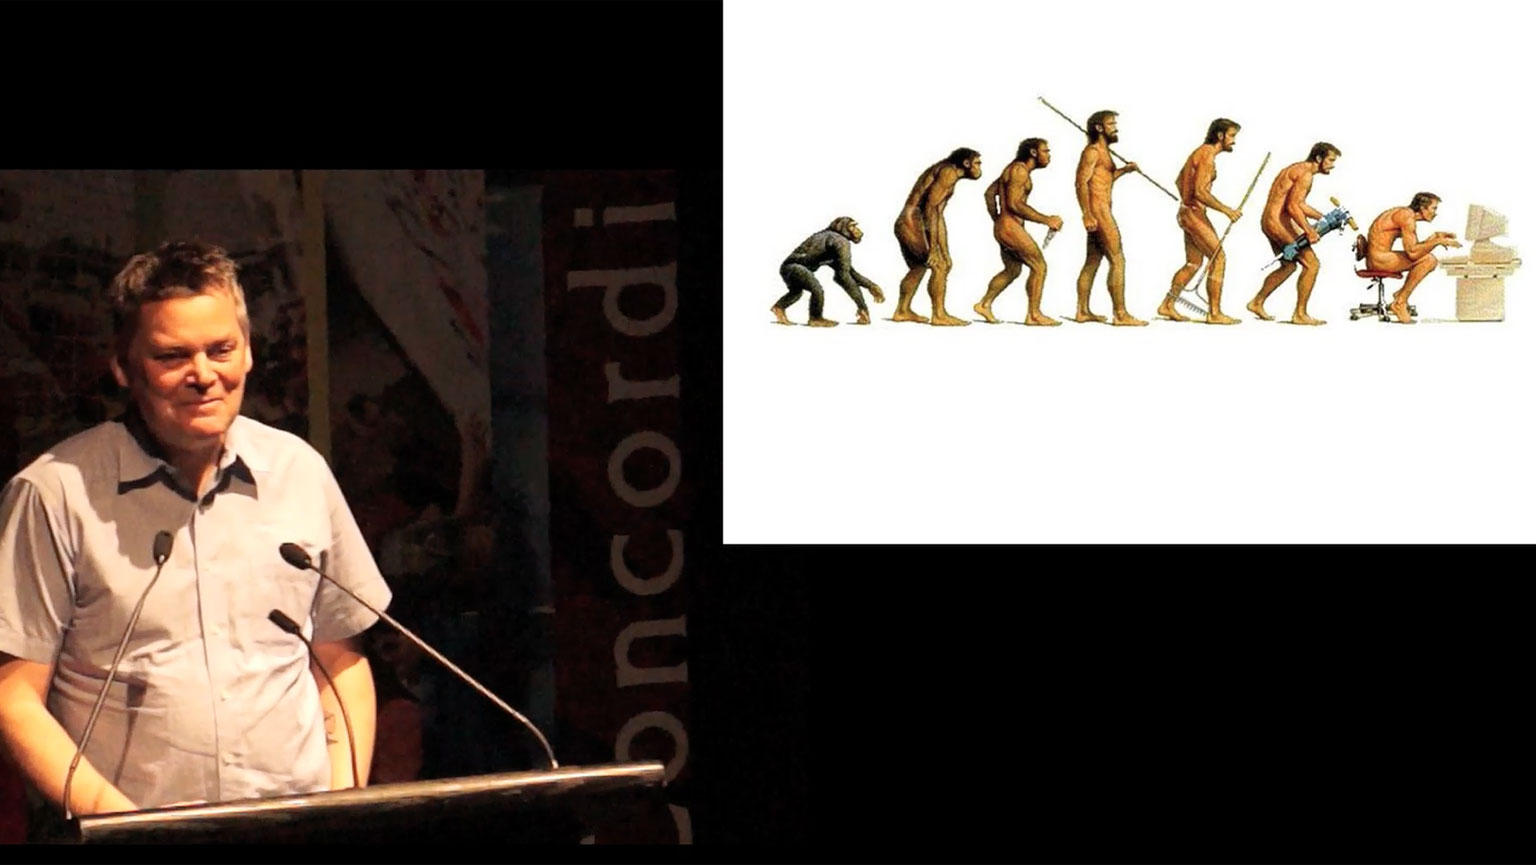 Video still of Mark Kingwell from The Walrus Talks Being Human